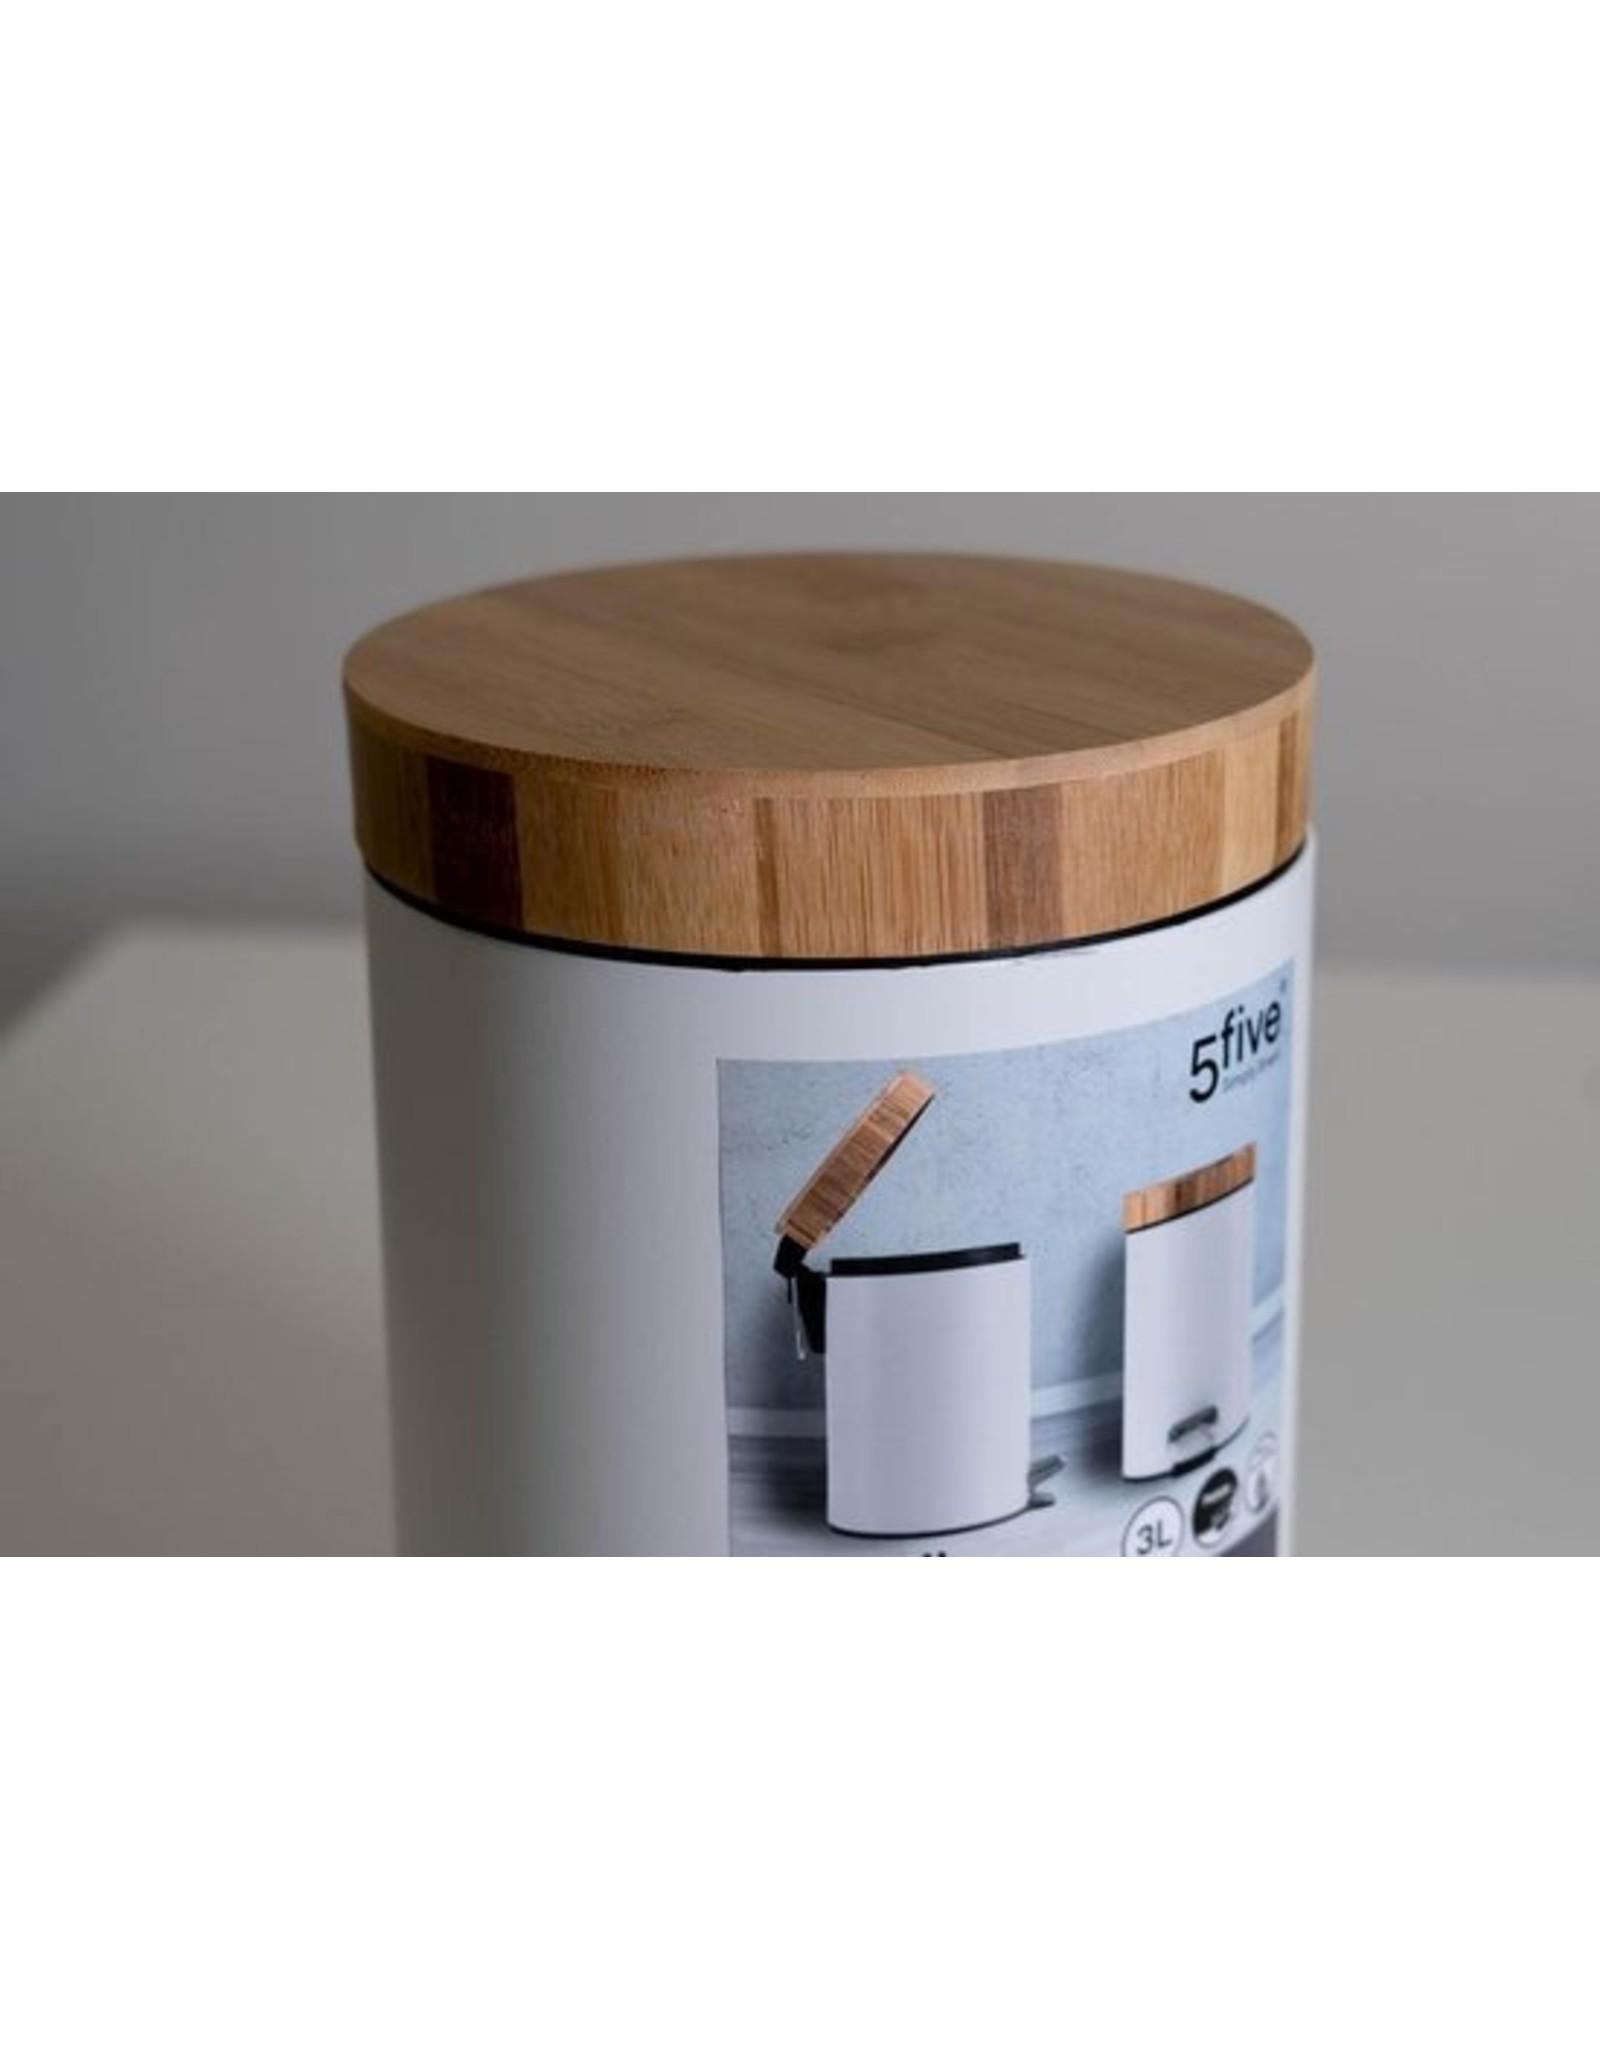 5Five - Witte Pedaalemmer - 3 Liter - Wit